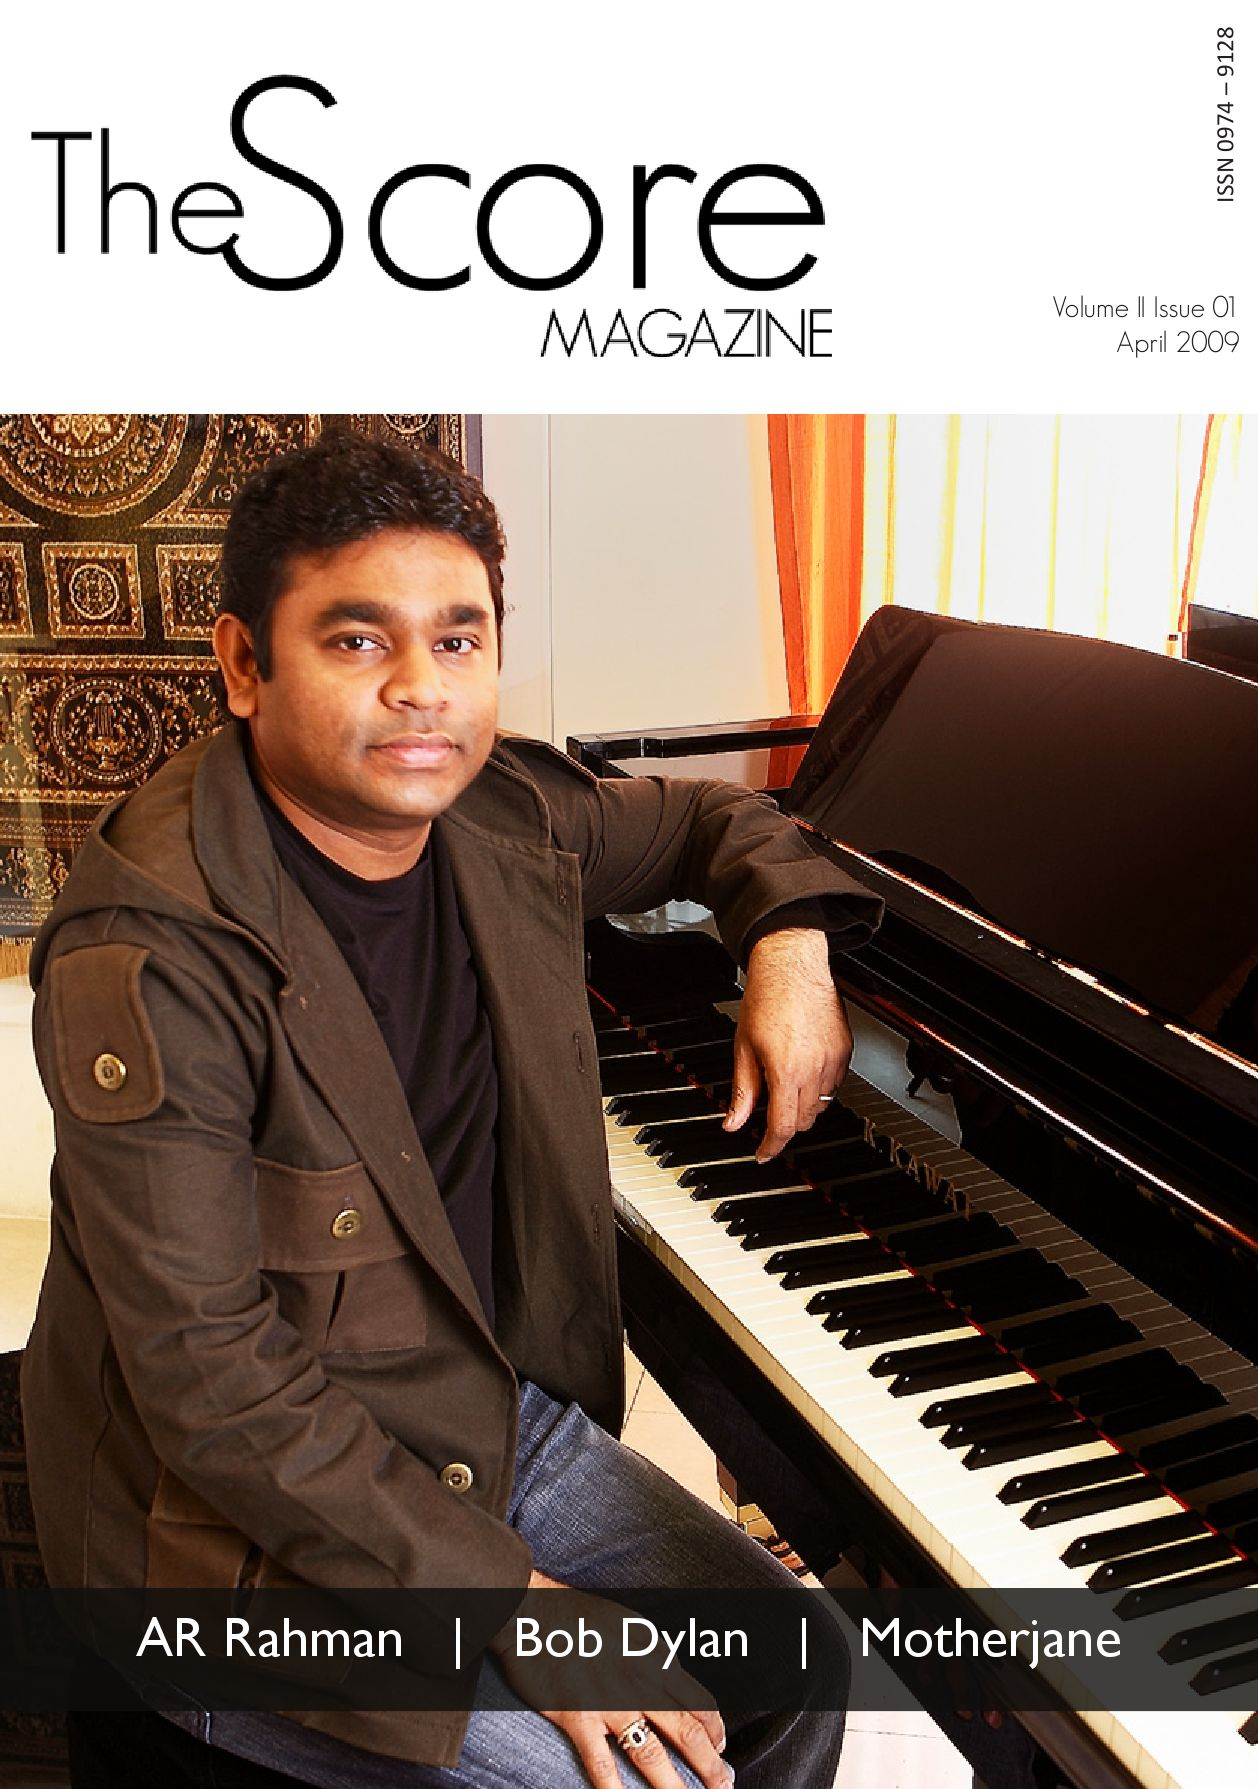 The Score Magazine April 2009 By The Score Magazine Issuu